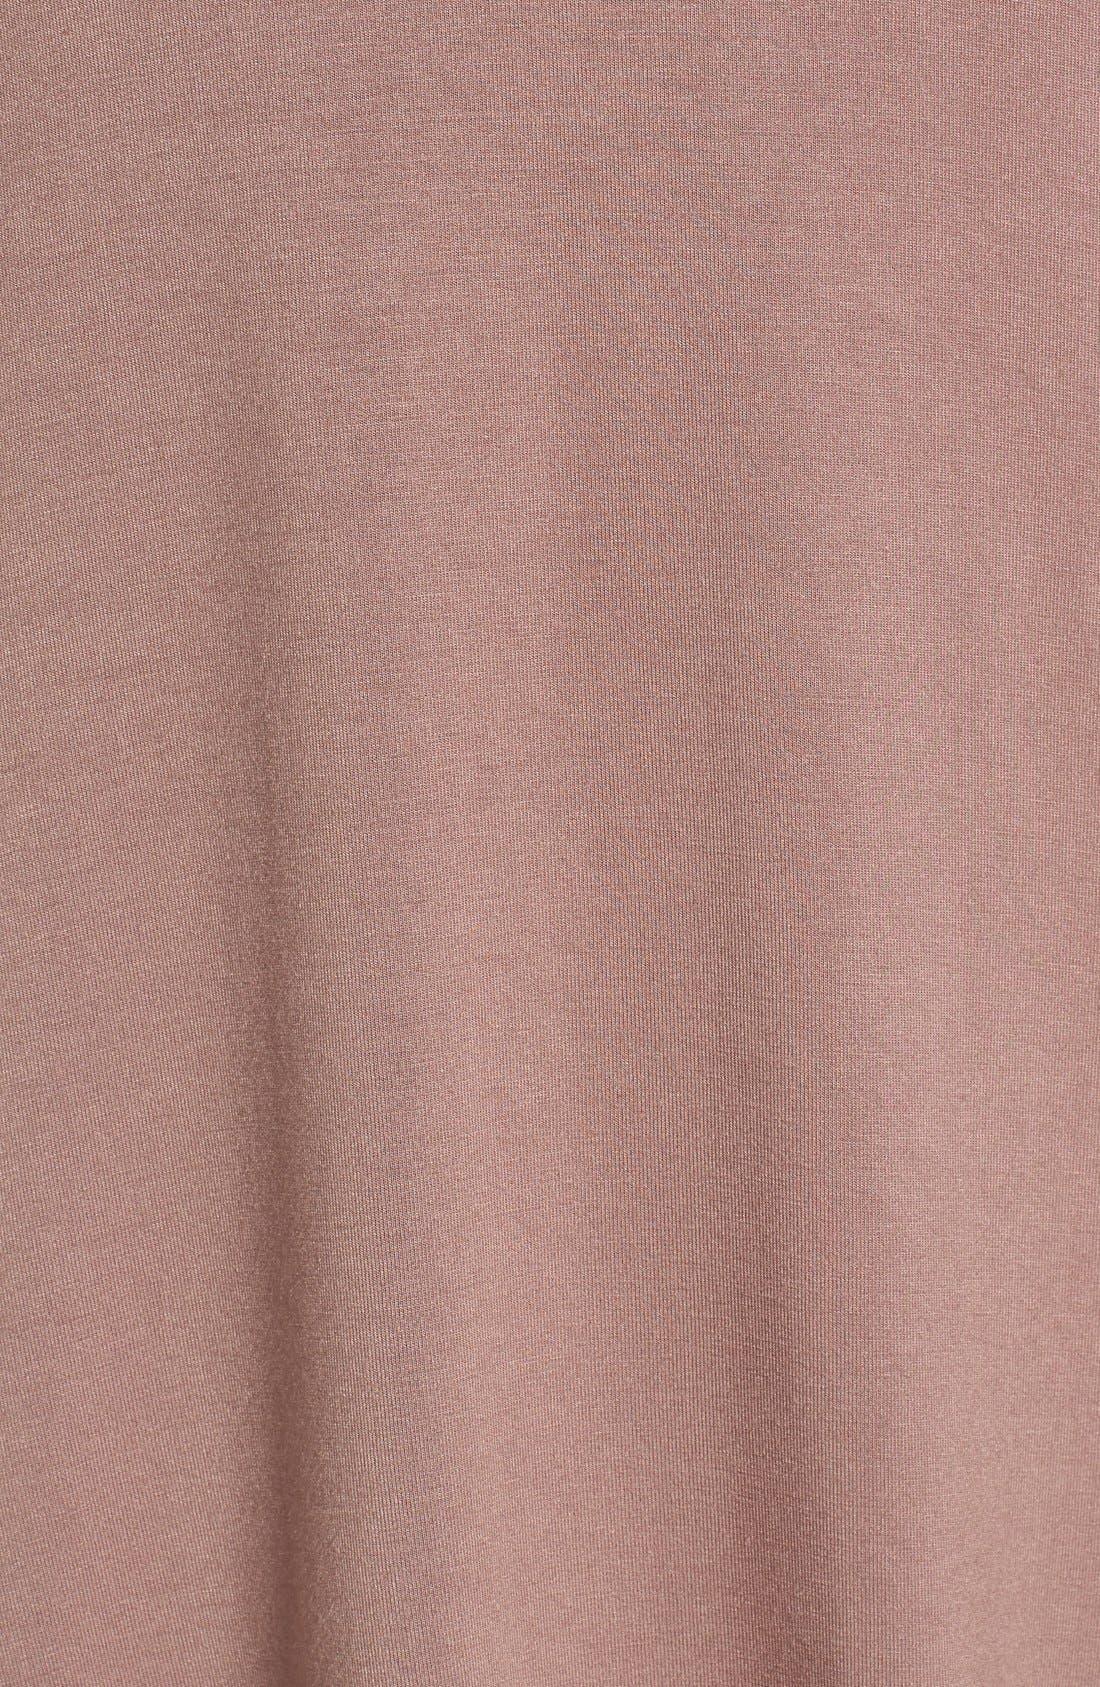 Cowl Neck Shift Dress,                             Alternate thumbnail 60, color,